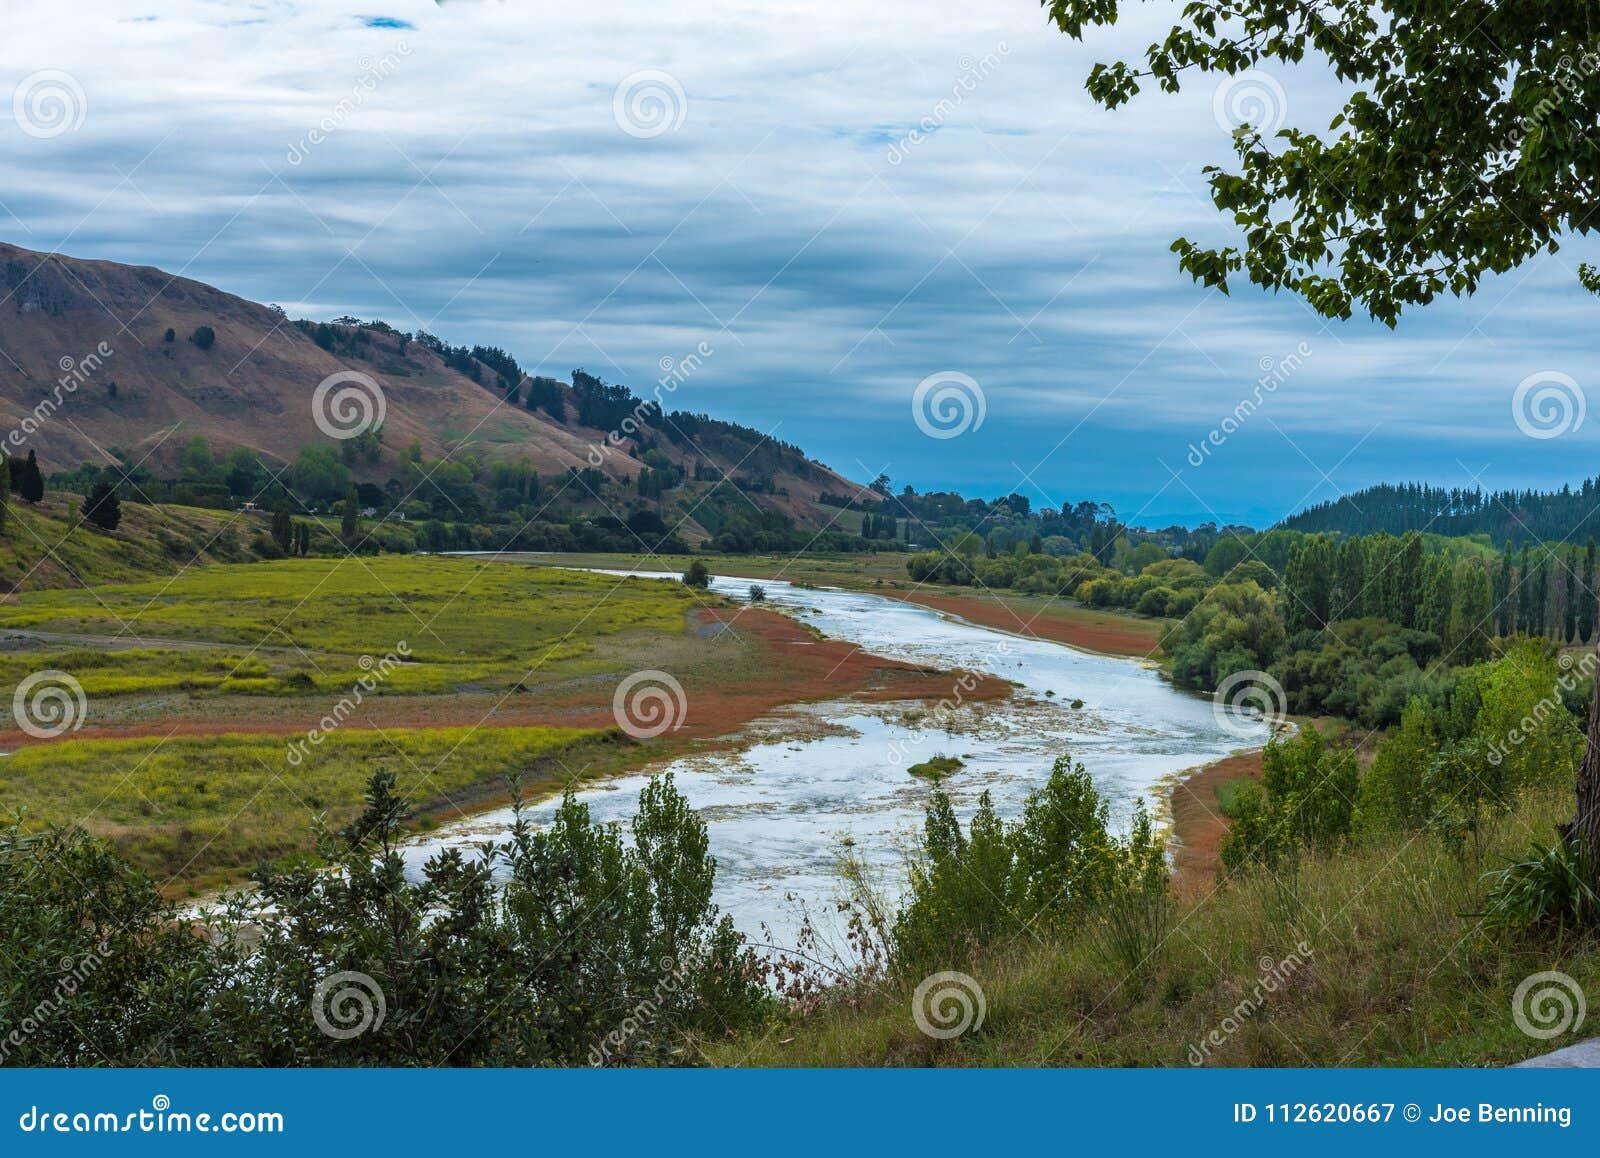 Grünes Tal in Neuseeland-Weinanbaugebiet